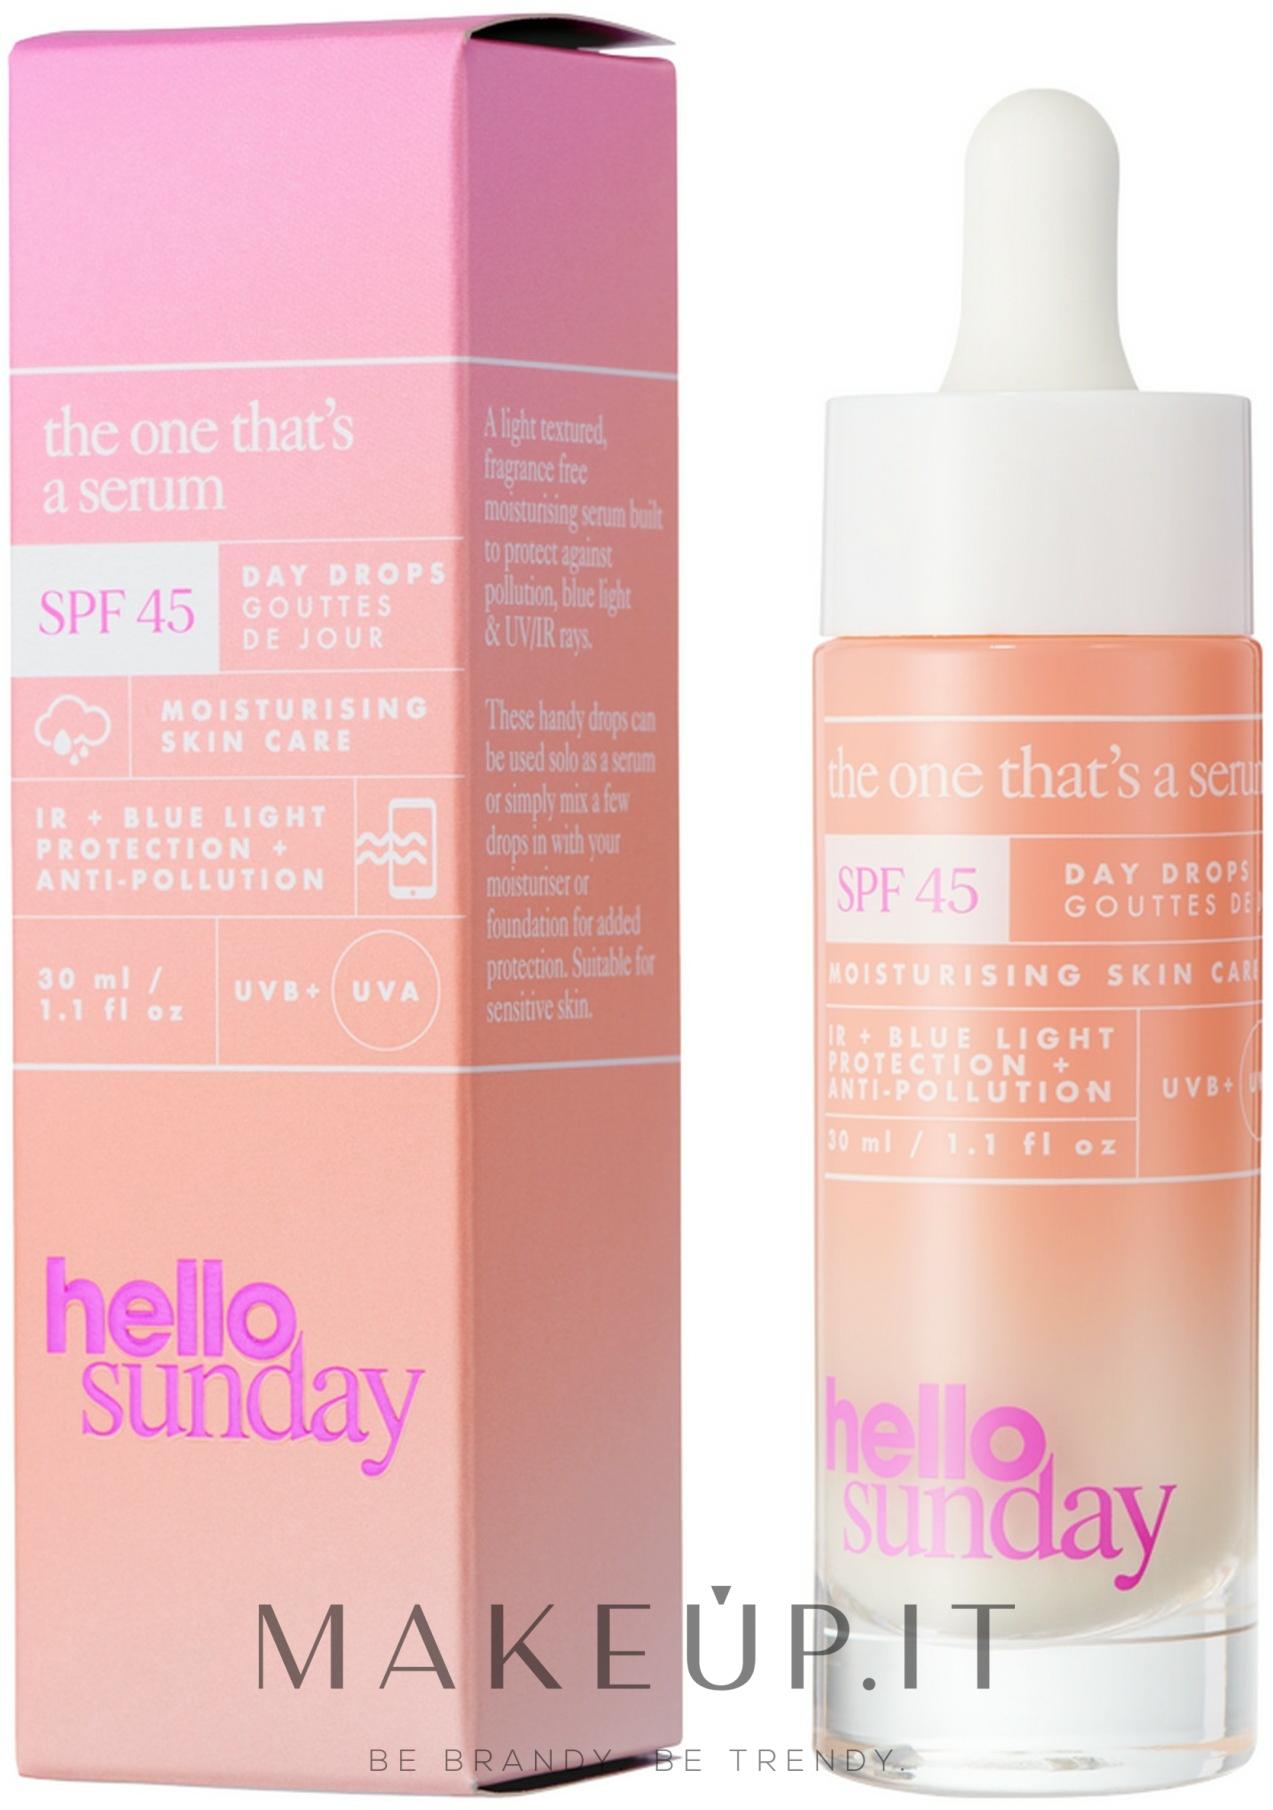 Siero solare viso - Hello Sunday The One That's A Serum Face Drops SPF 45 — foto 30 ml